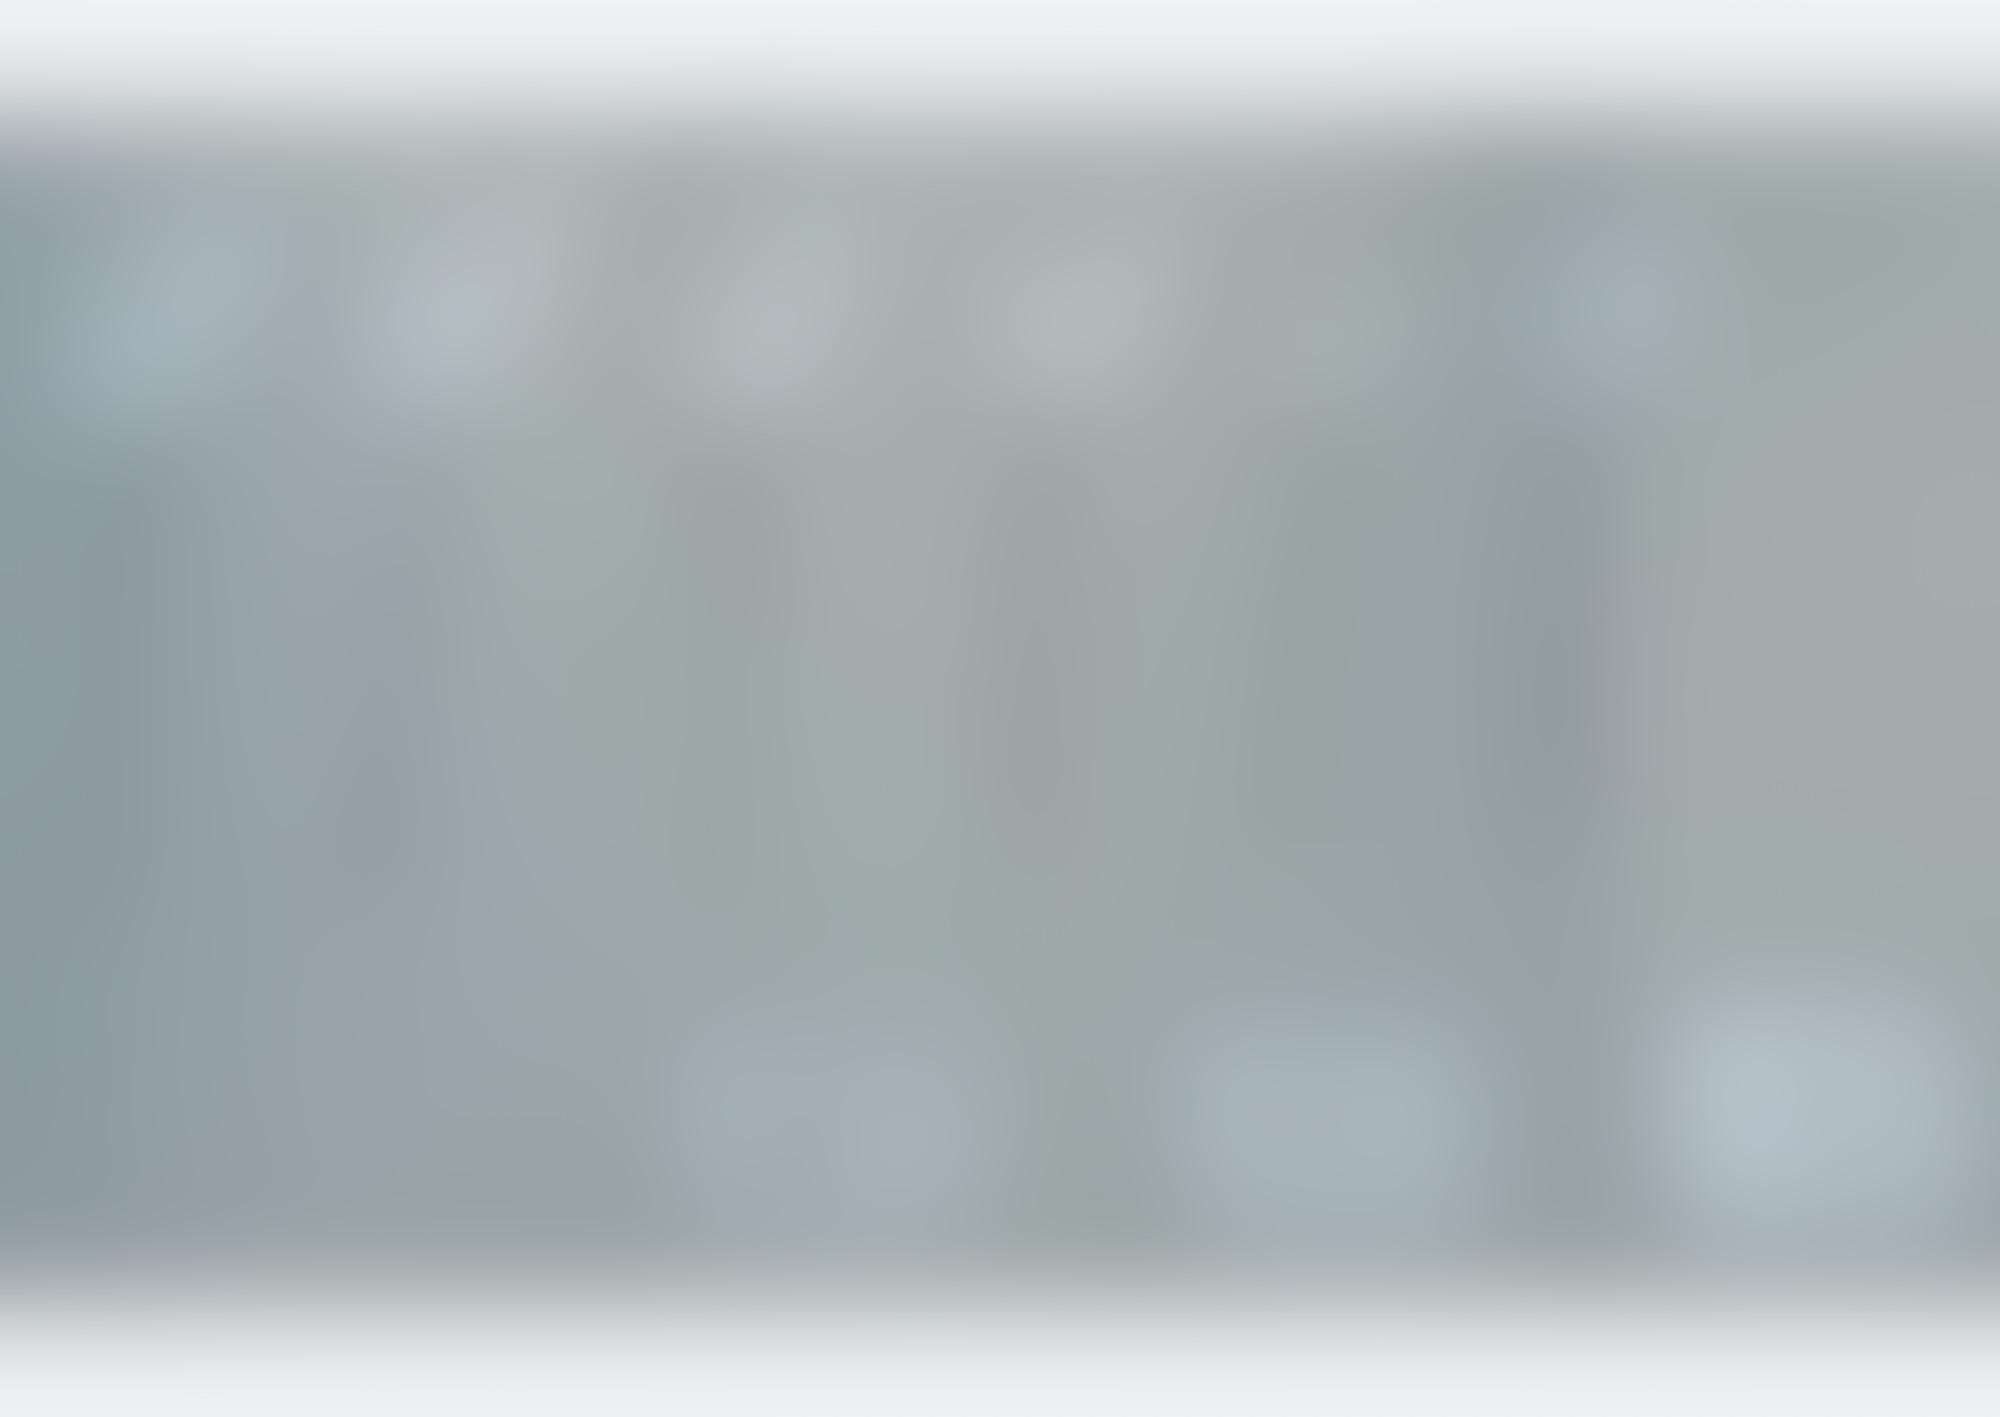 Firsthand header test2 3626d2998fb5d134a0dd6cfbd9ee8a26 autocompressfitresizeixlibphp 1 1 0max h2000max w3 D2000q80saec9ef70447ed06c438b782f4f7edc32